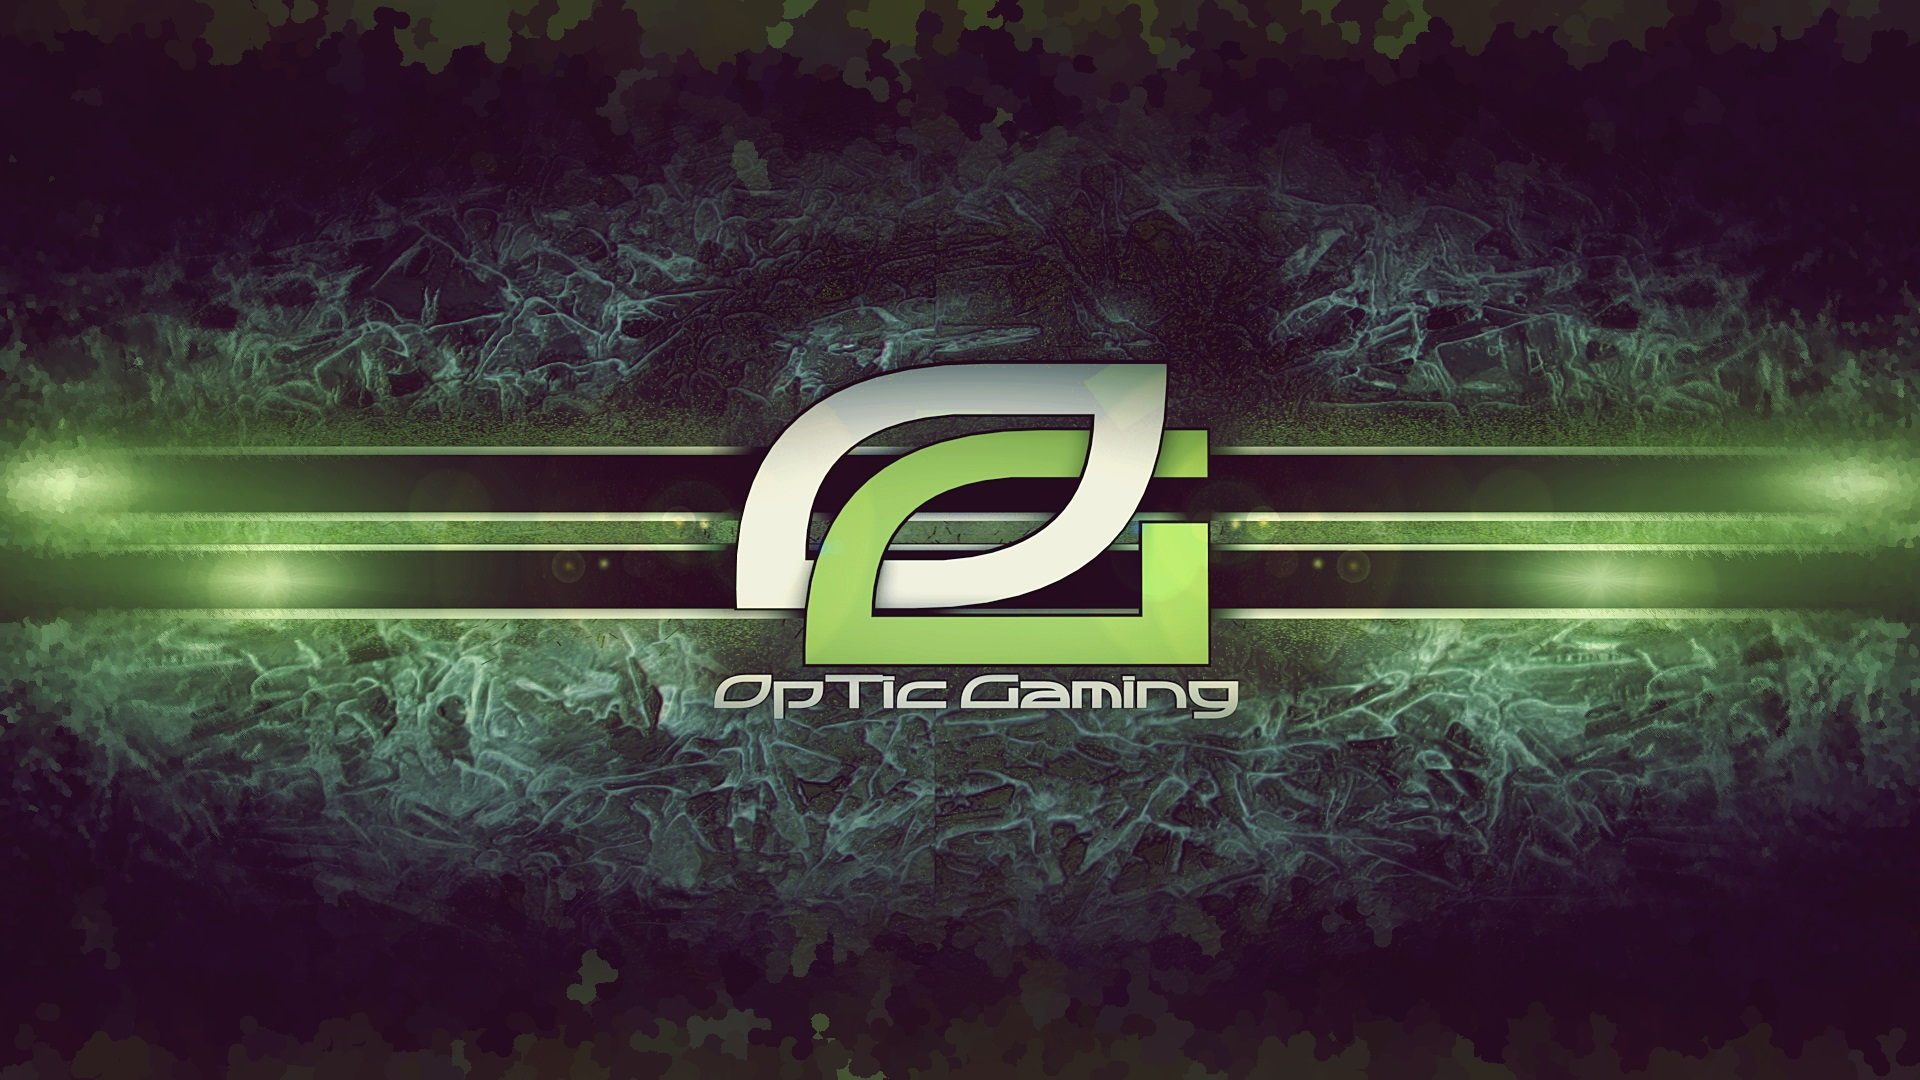 optic gaming wallpaper6 - photo #1